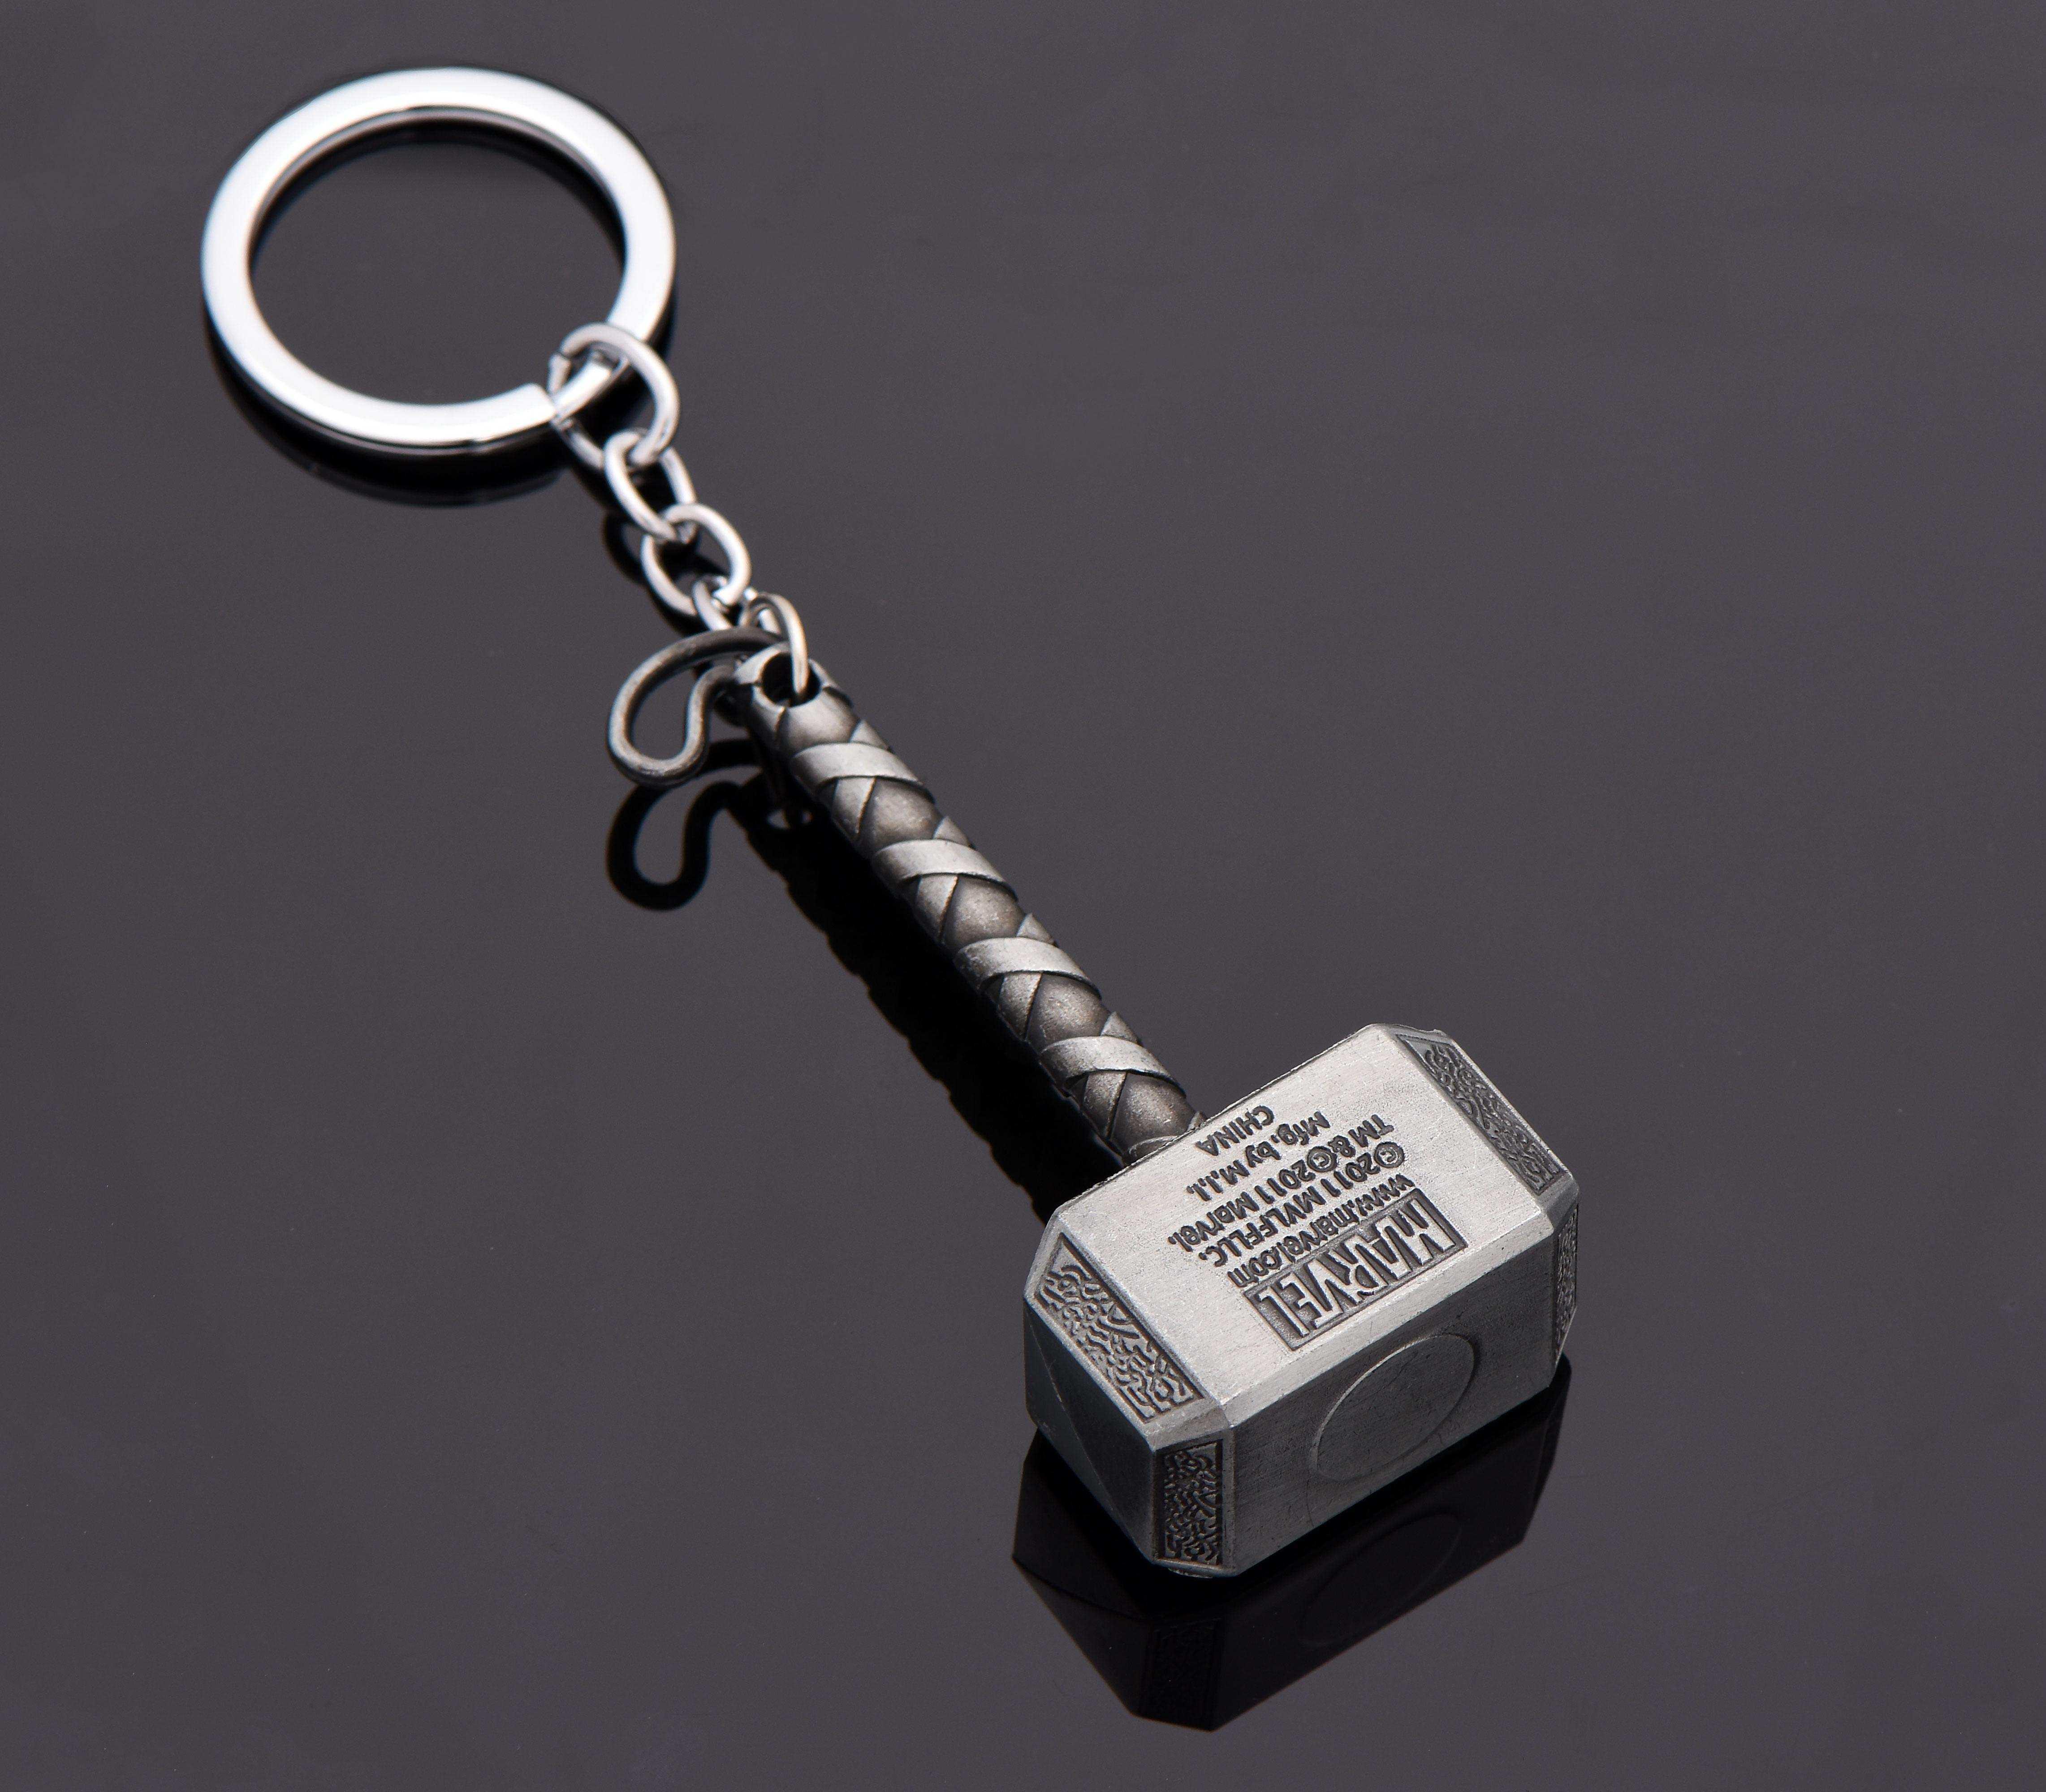 Thor Mjolnir Çekiç Anahtarlık - ANA0058